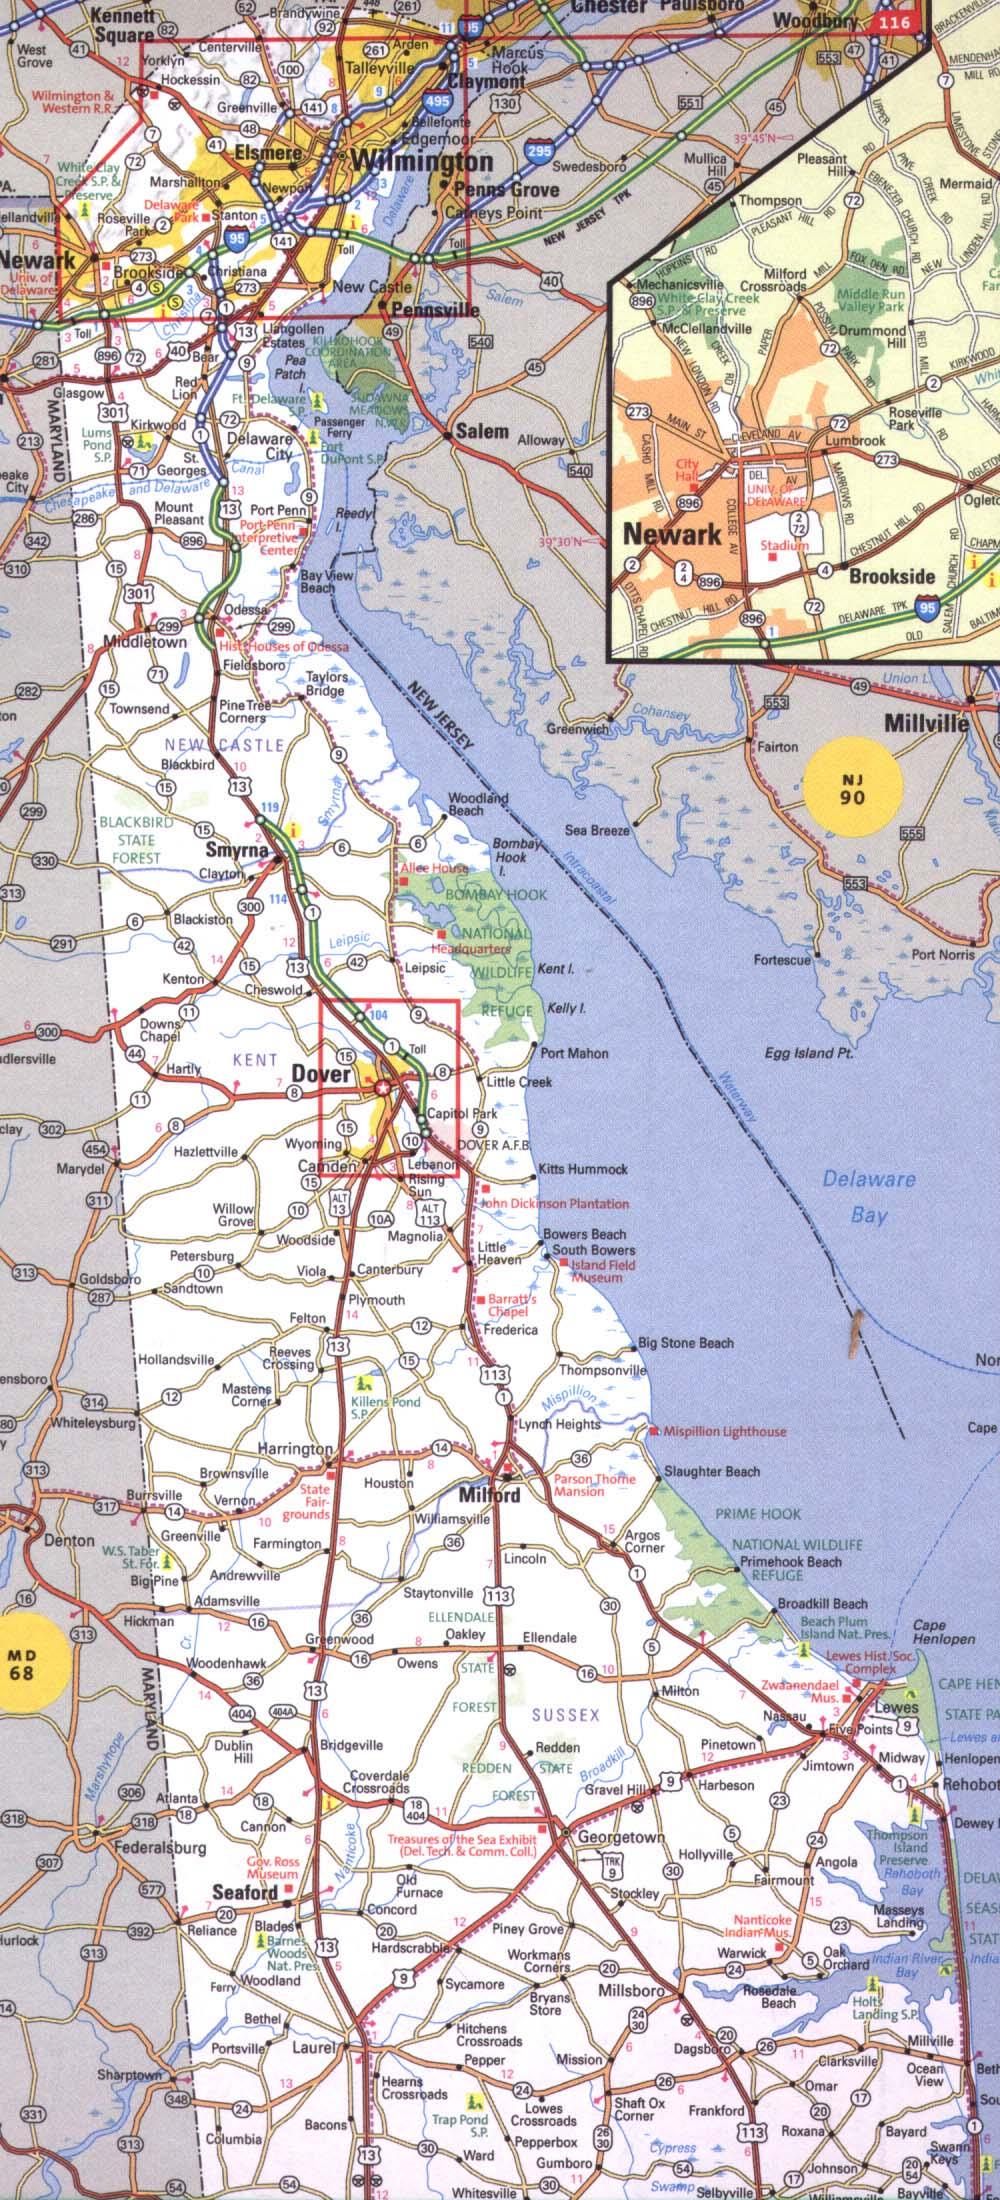 map of eau claire wi with Road Maps on Supreme Court Takes Wisconsin Gerrymandering Case as well Printable brooklyn zip code map together with Buy Sarees Online Benarasi Dhakai Jamdani Chiffon Adimohinimohankanjilal besides Mbirika further Redgranite.